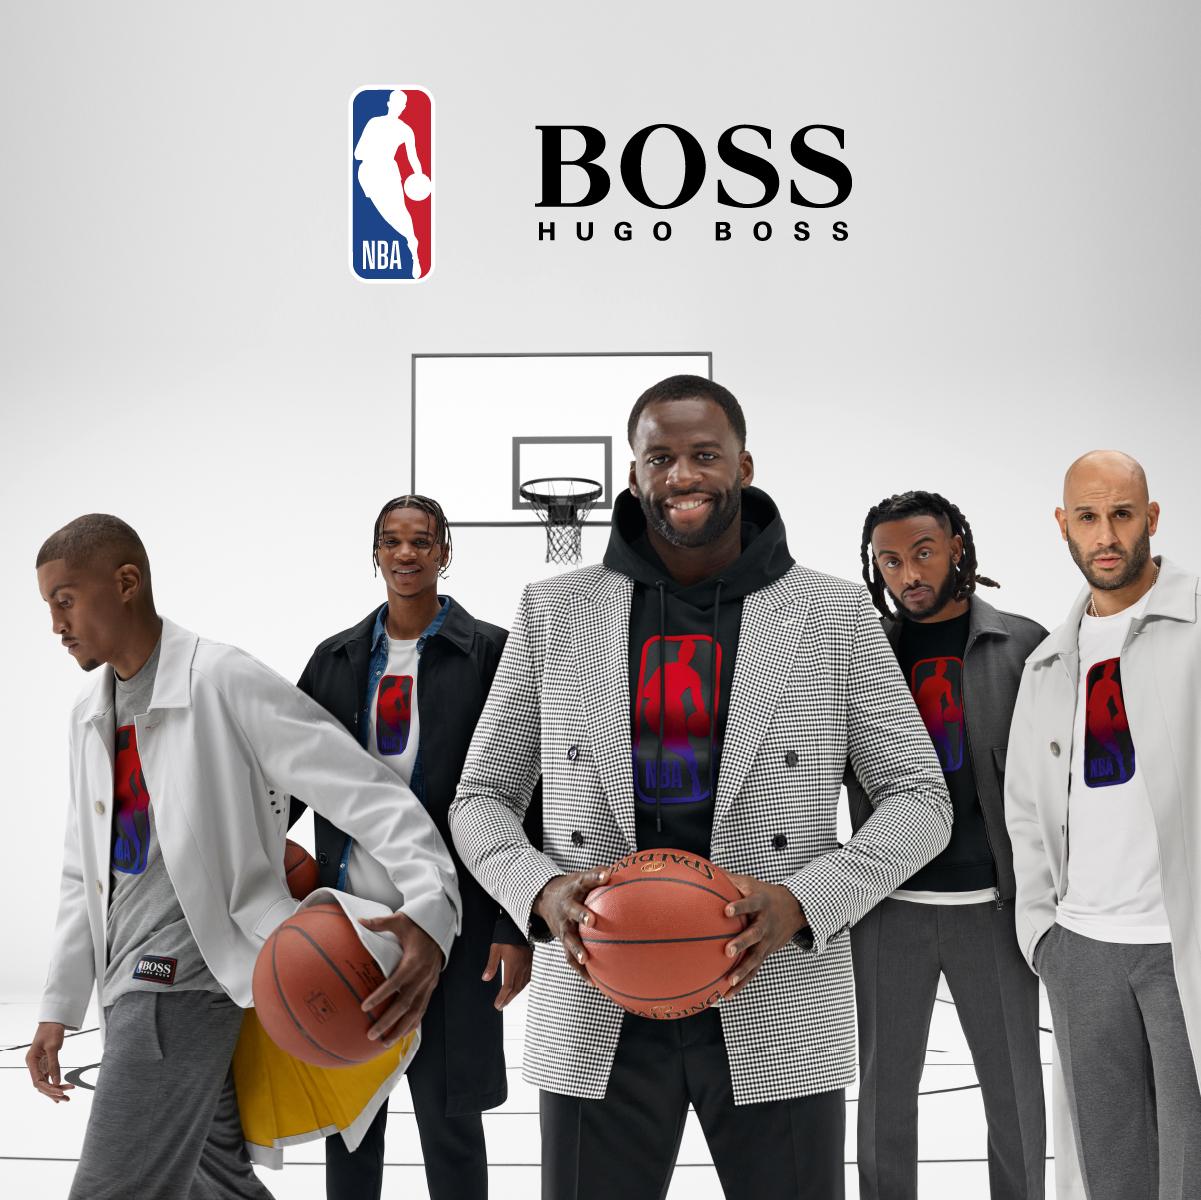 Boss Logo, basketball player